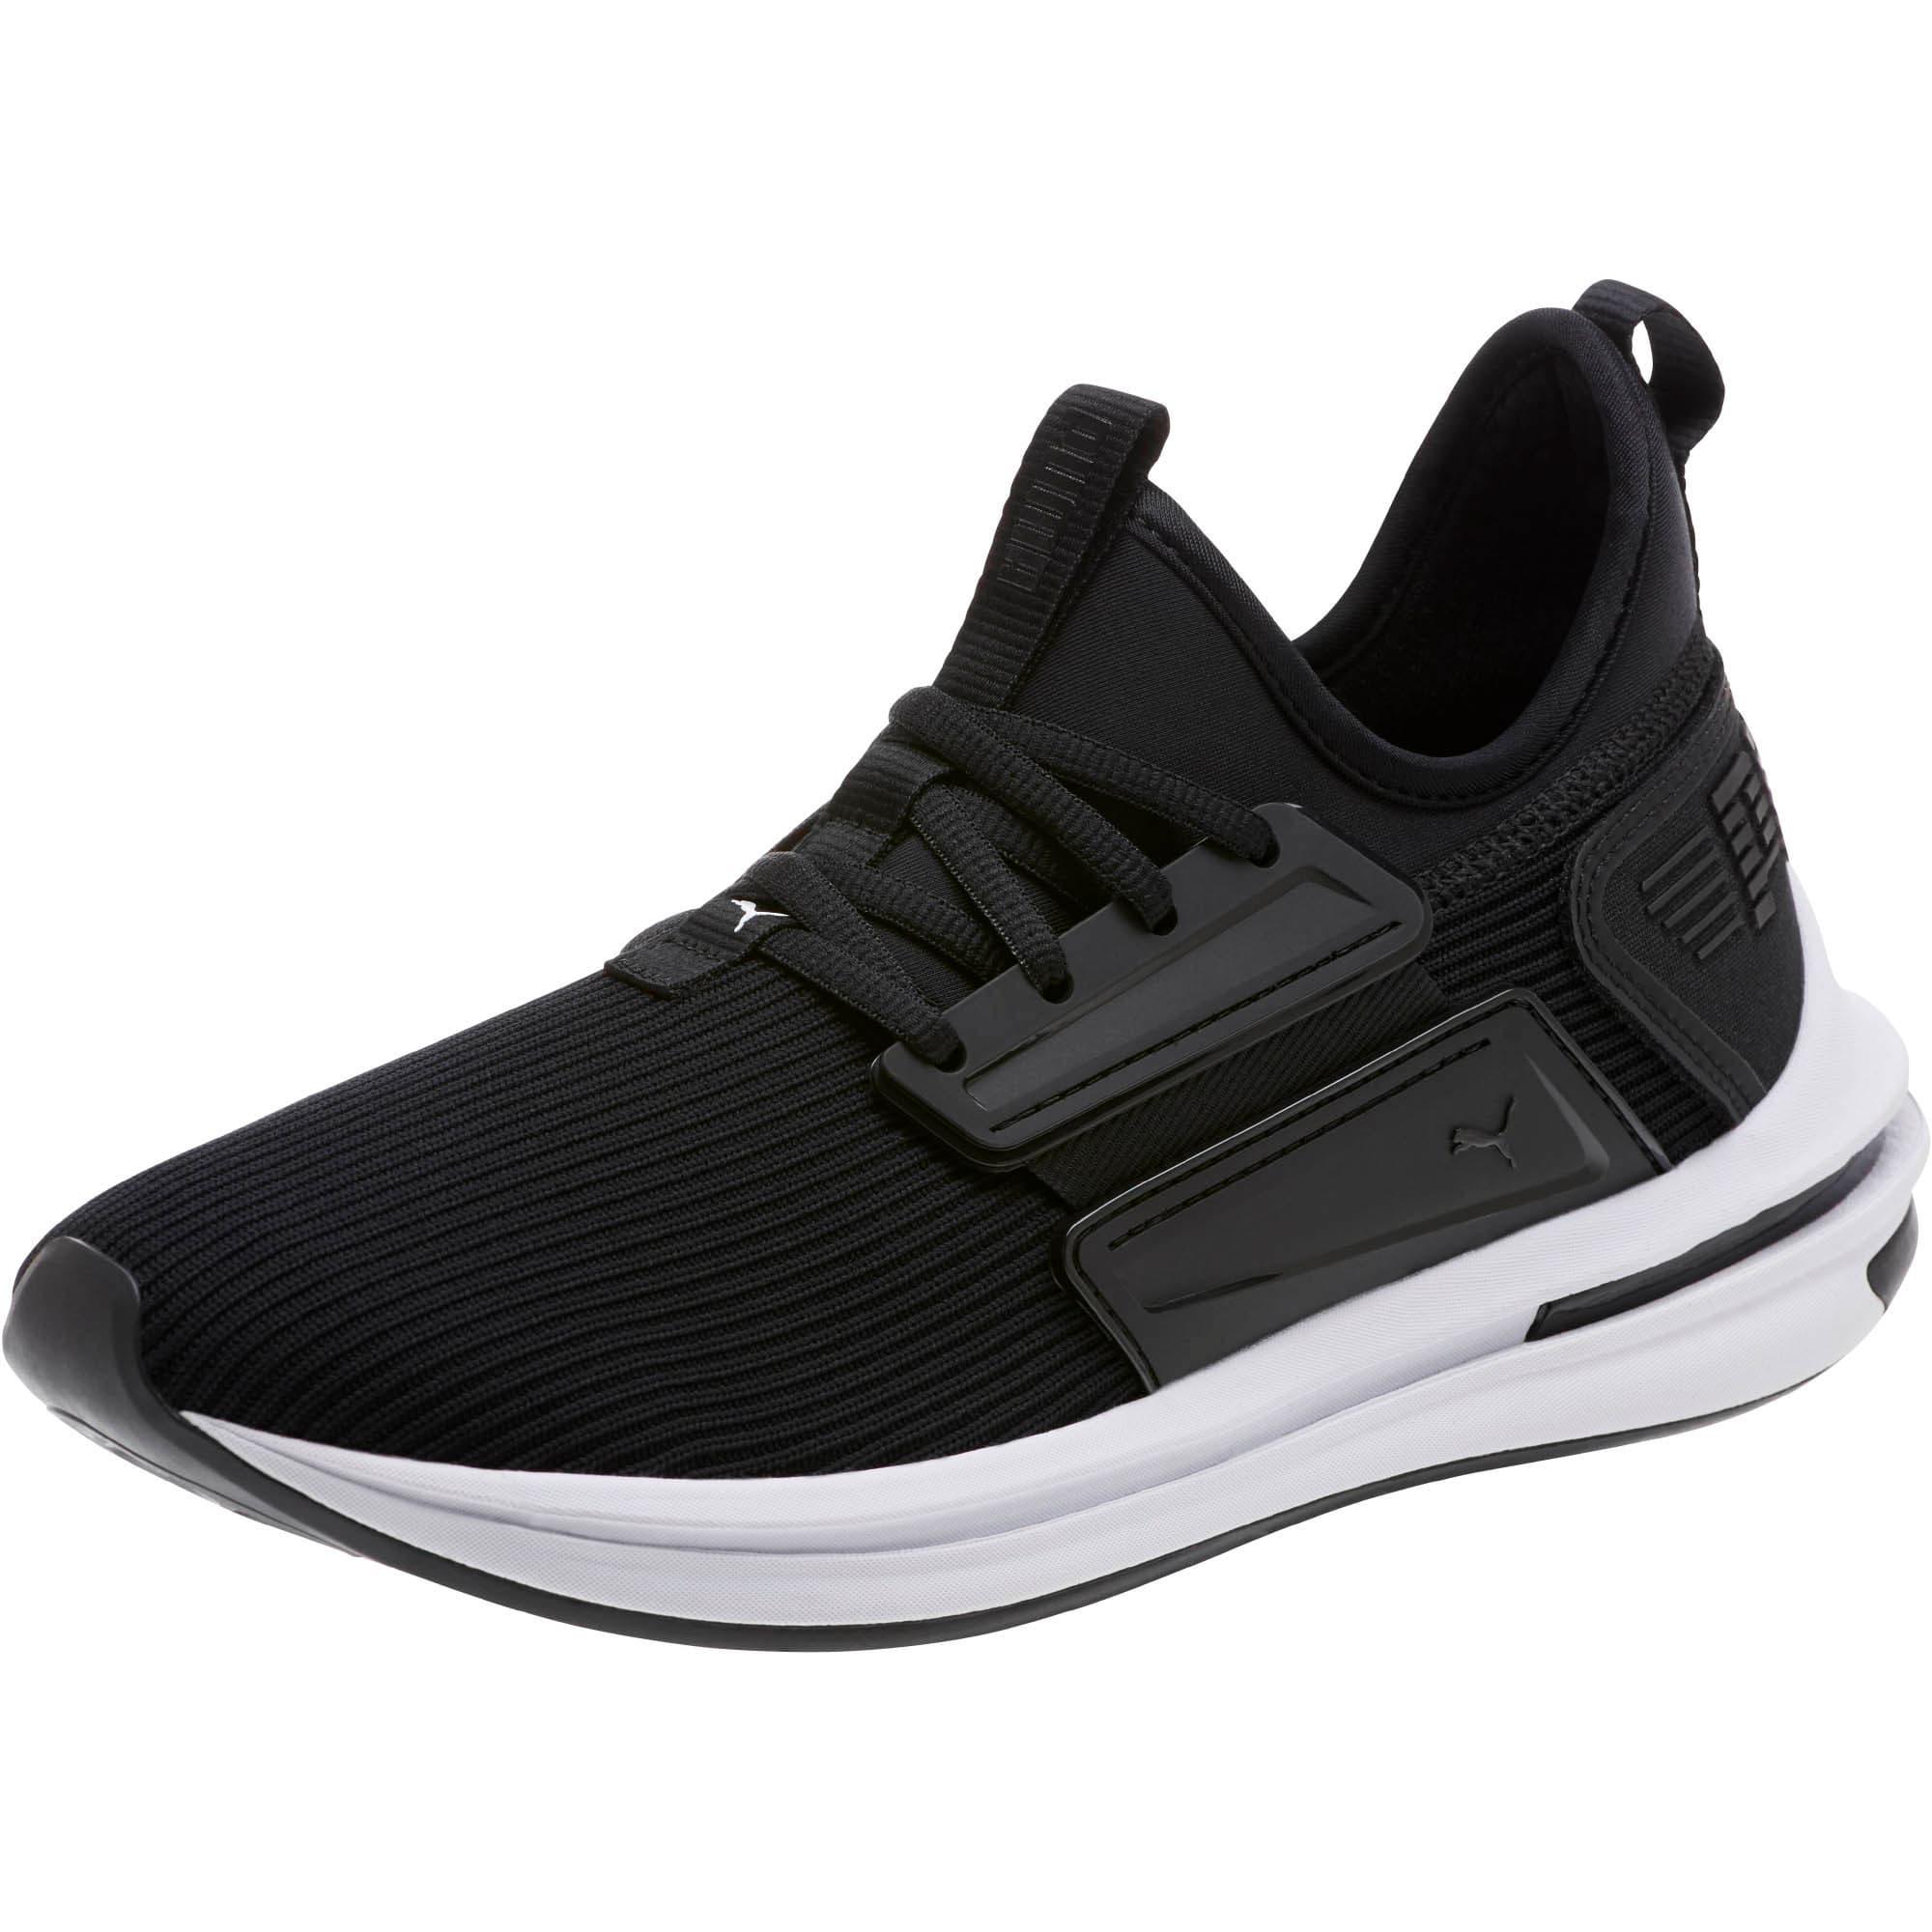 Thumbnail 1 of IGNITE Limitless Women's Running Shoes, Puma Black, medium